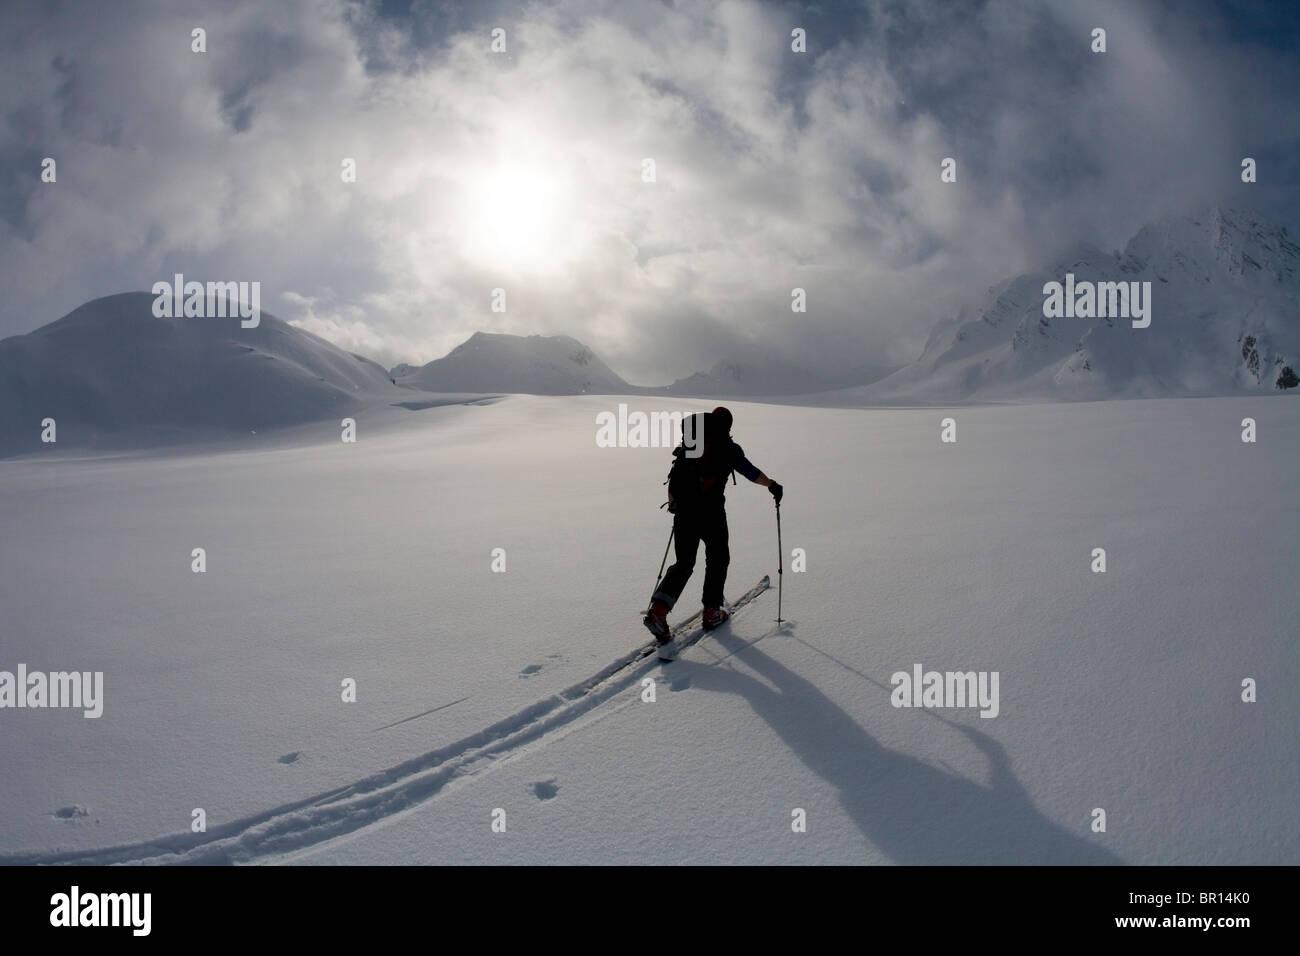 Backcountry skier crosses glacier under late day stormy sky. - Stock Image